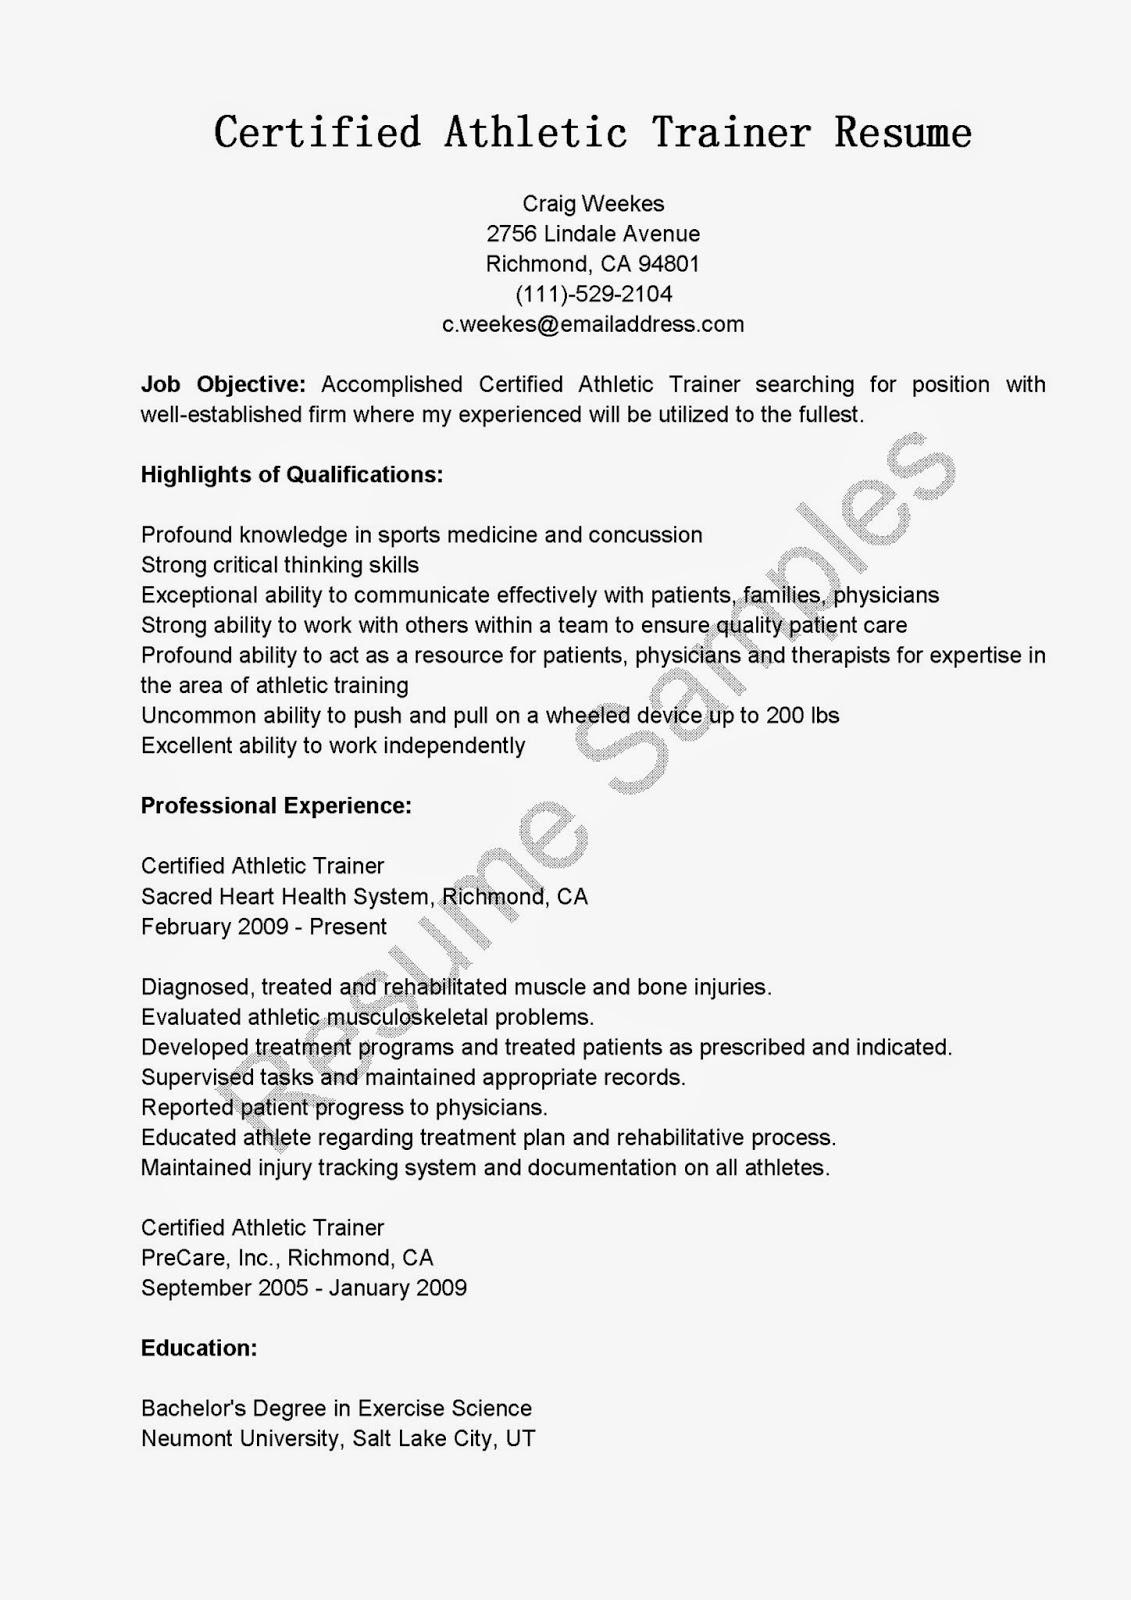 resume for athletic trainer Oylekalakaarico